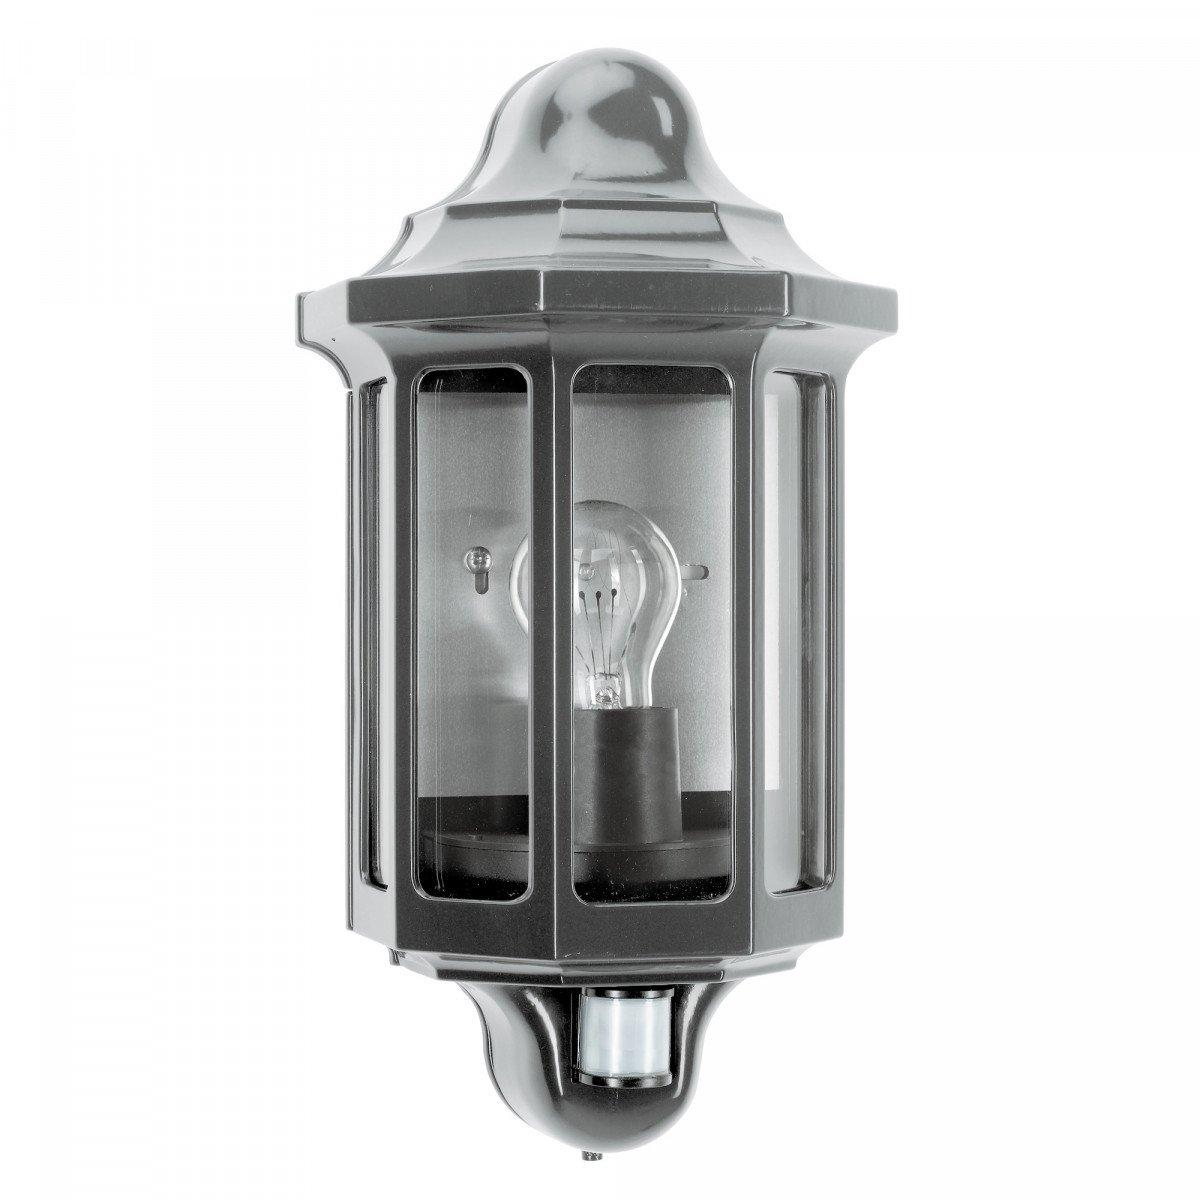 Buitenlamp met sensor - KS Loreo buitenlamp met bewegingssensor